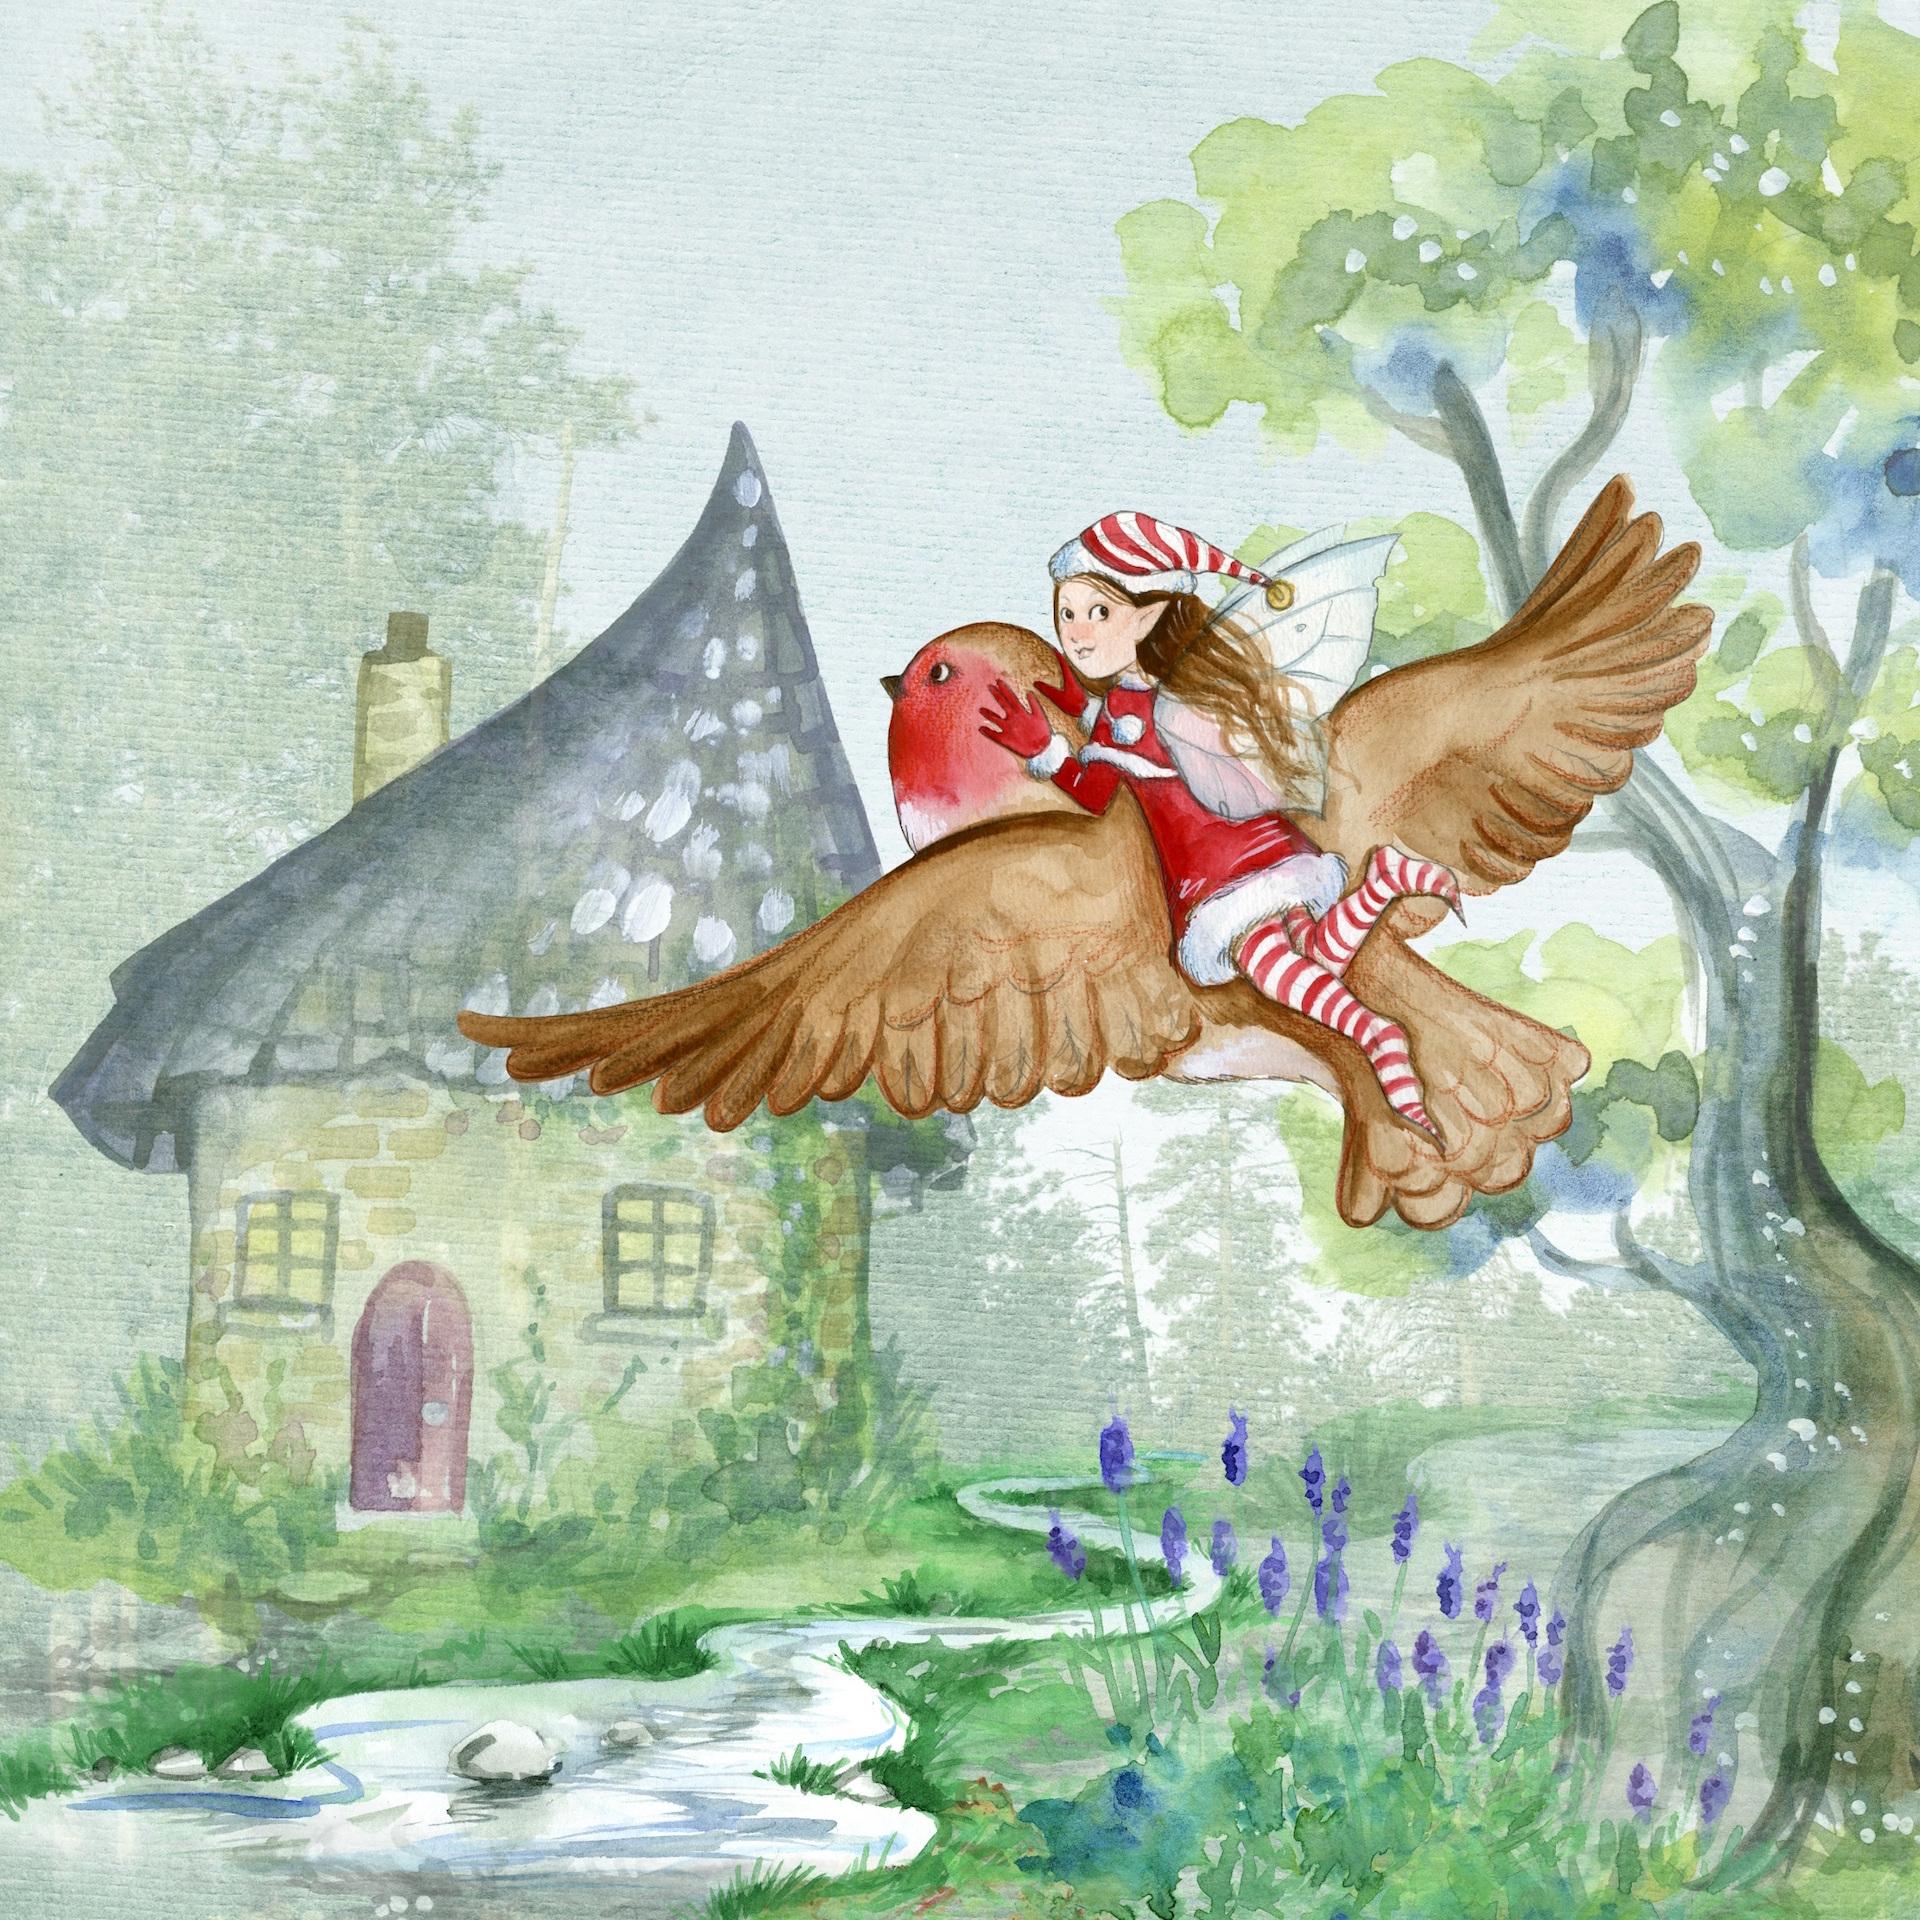 Fantasy, Tale, jeune fille, Oiseau, Mystère - Fonds d'écran HD - Professor-falken.com